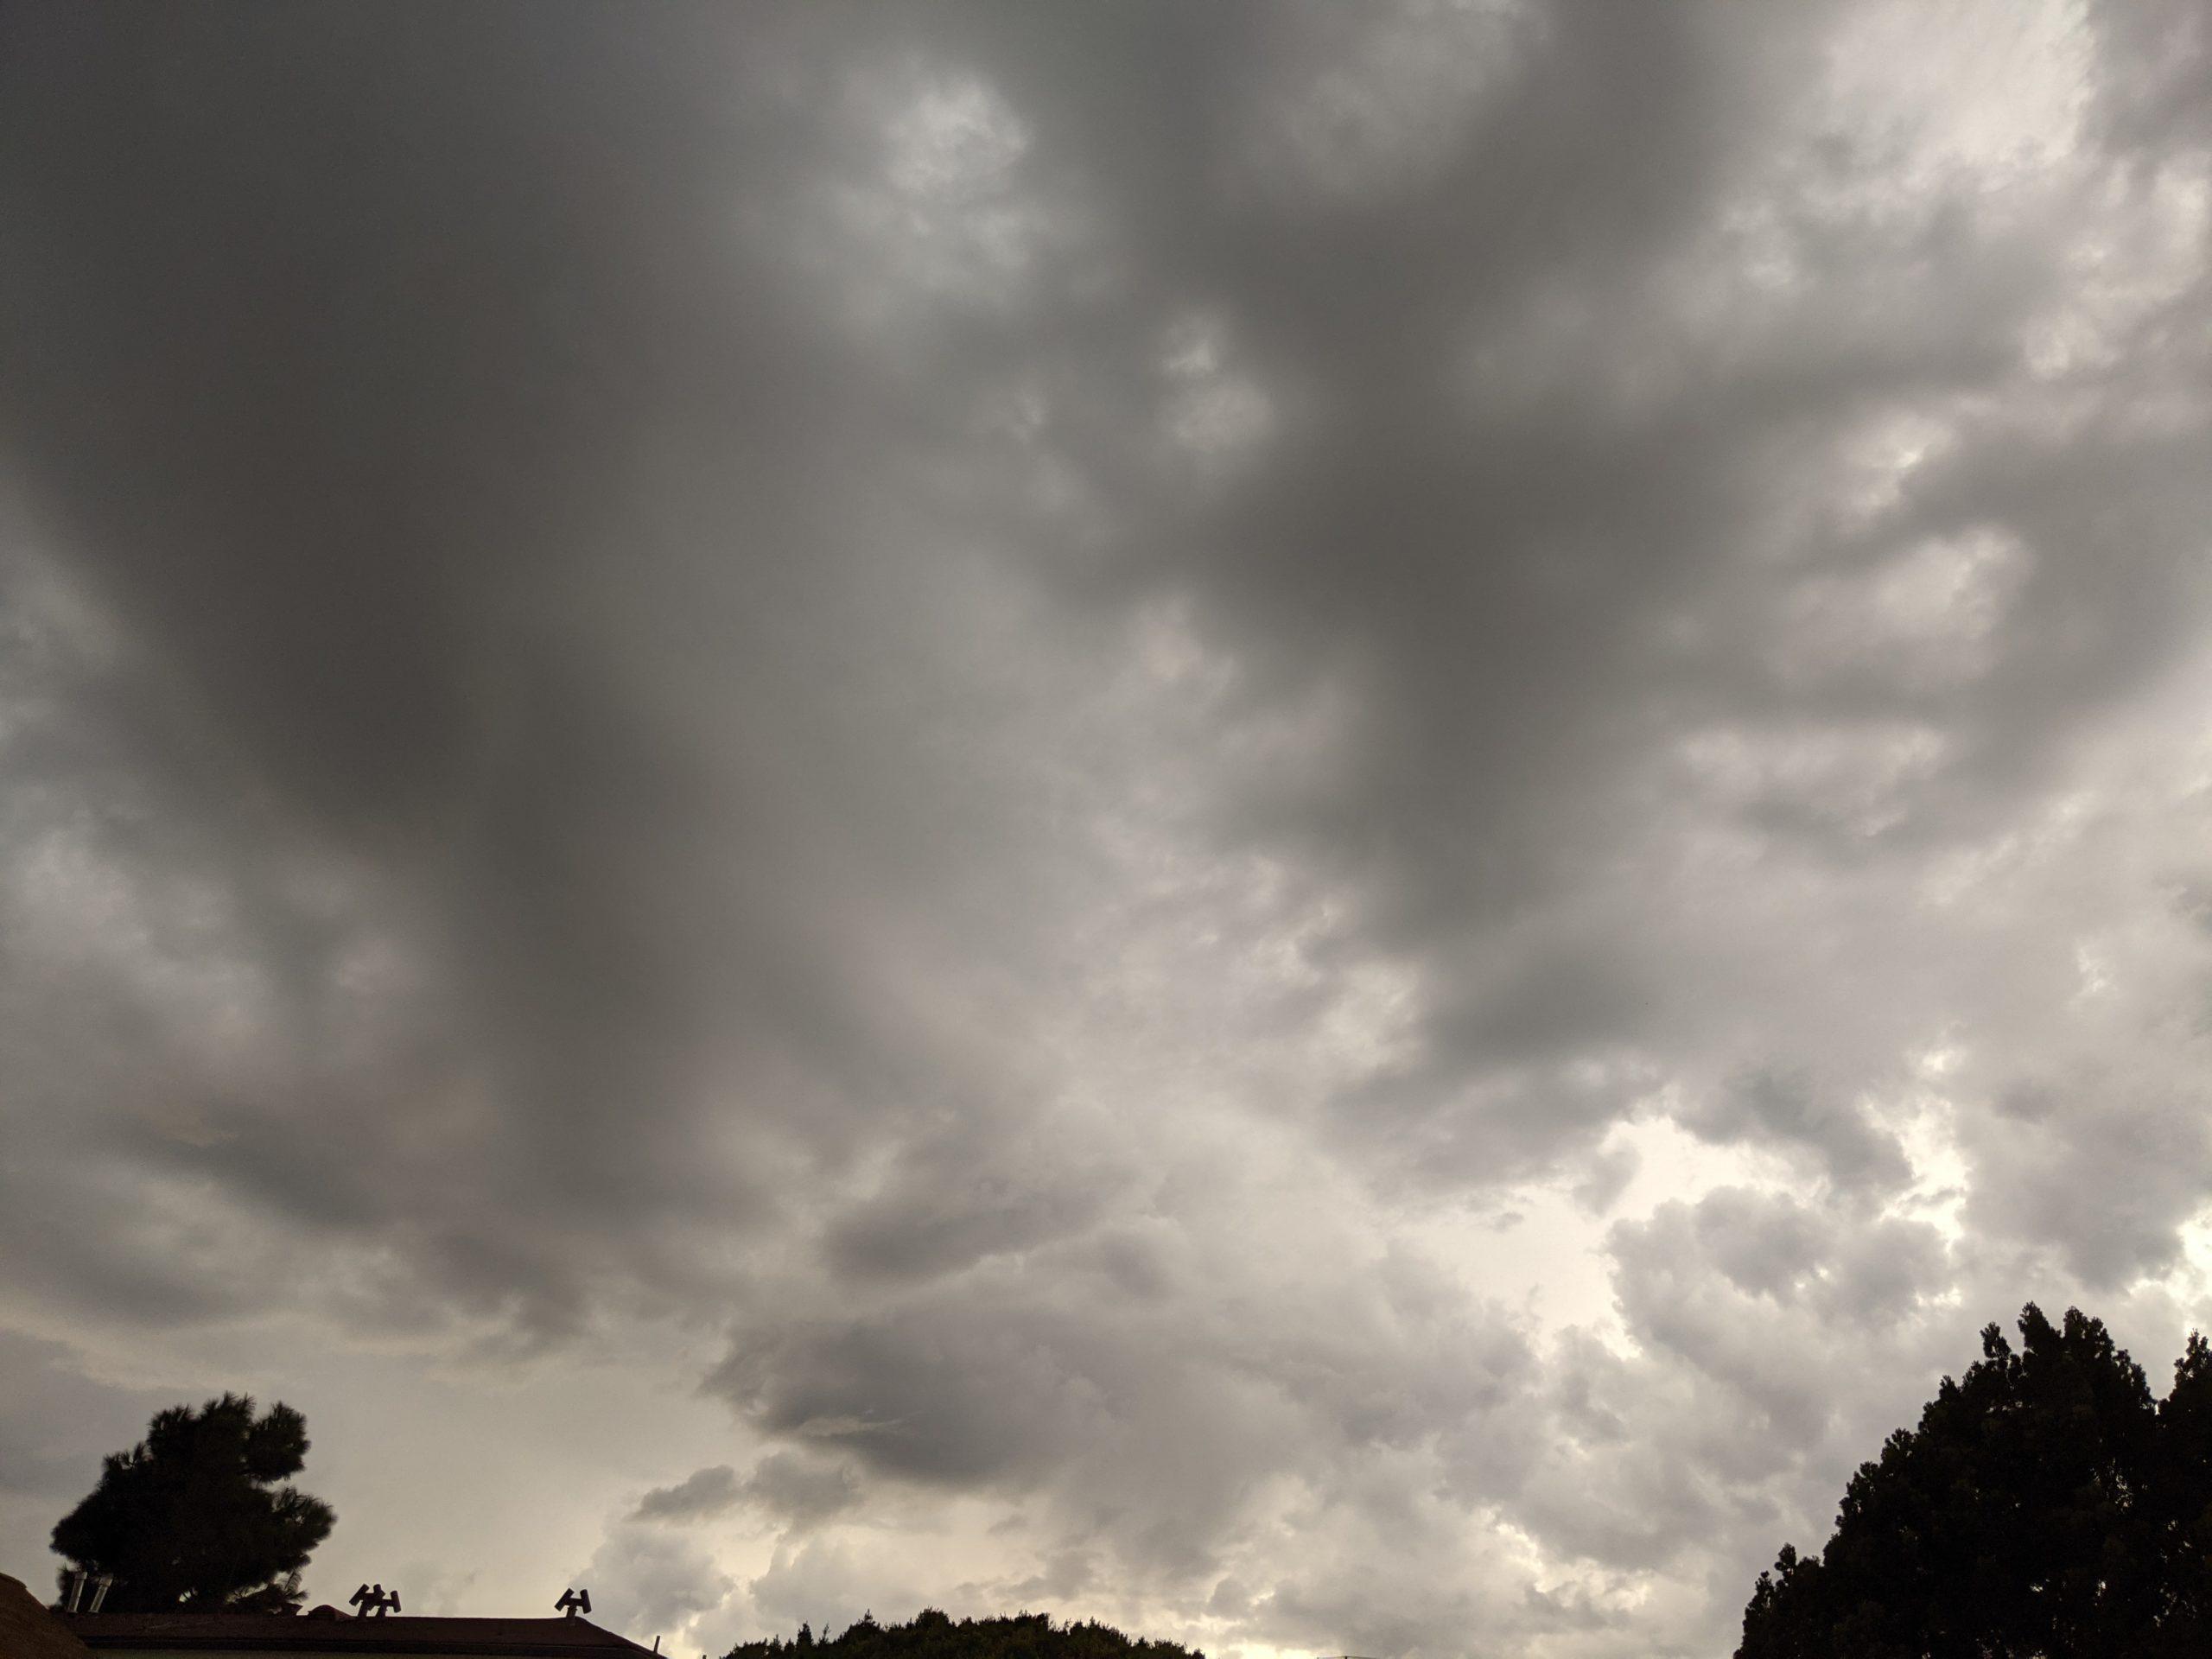 Rain at background over Santa Monica, California, on October 4, 2021